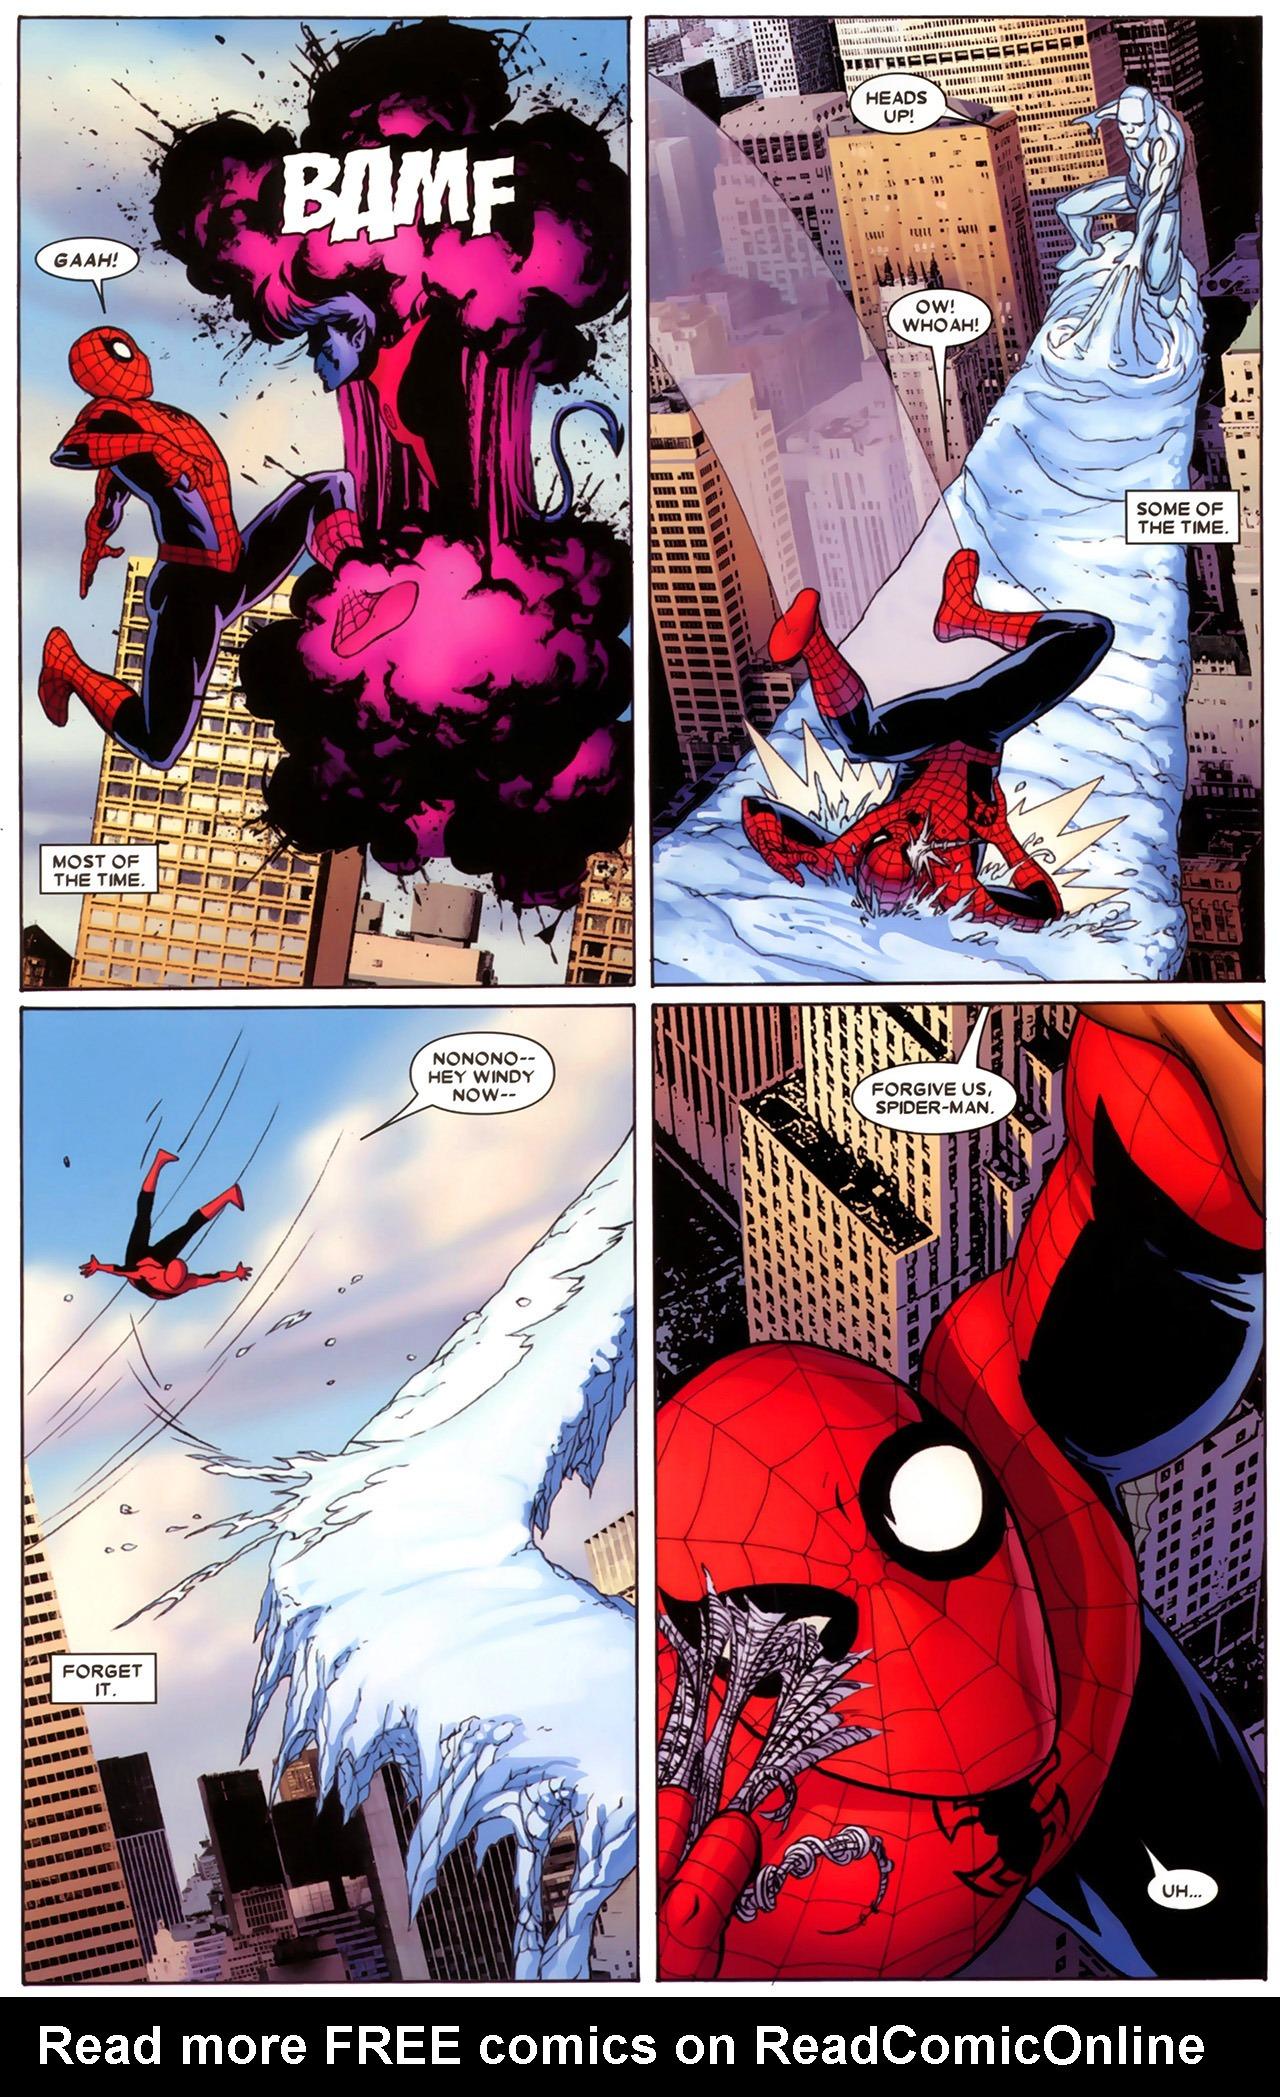 Read online Giant-Size Astonishing X-Men comic -  Issue # Full - 5